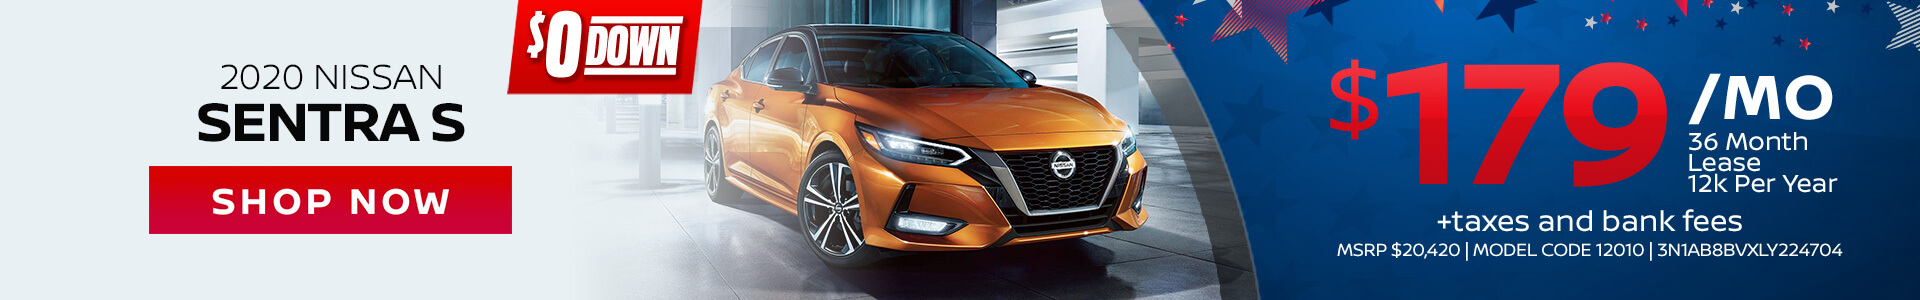 Nissan Sentra $179 Lease